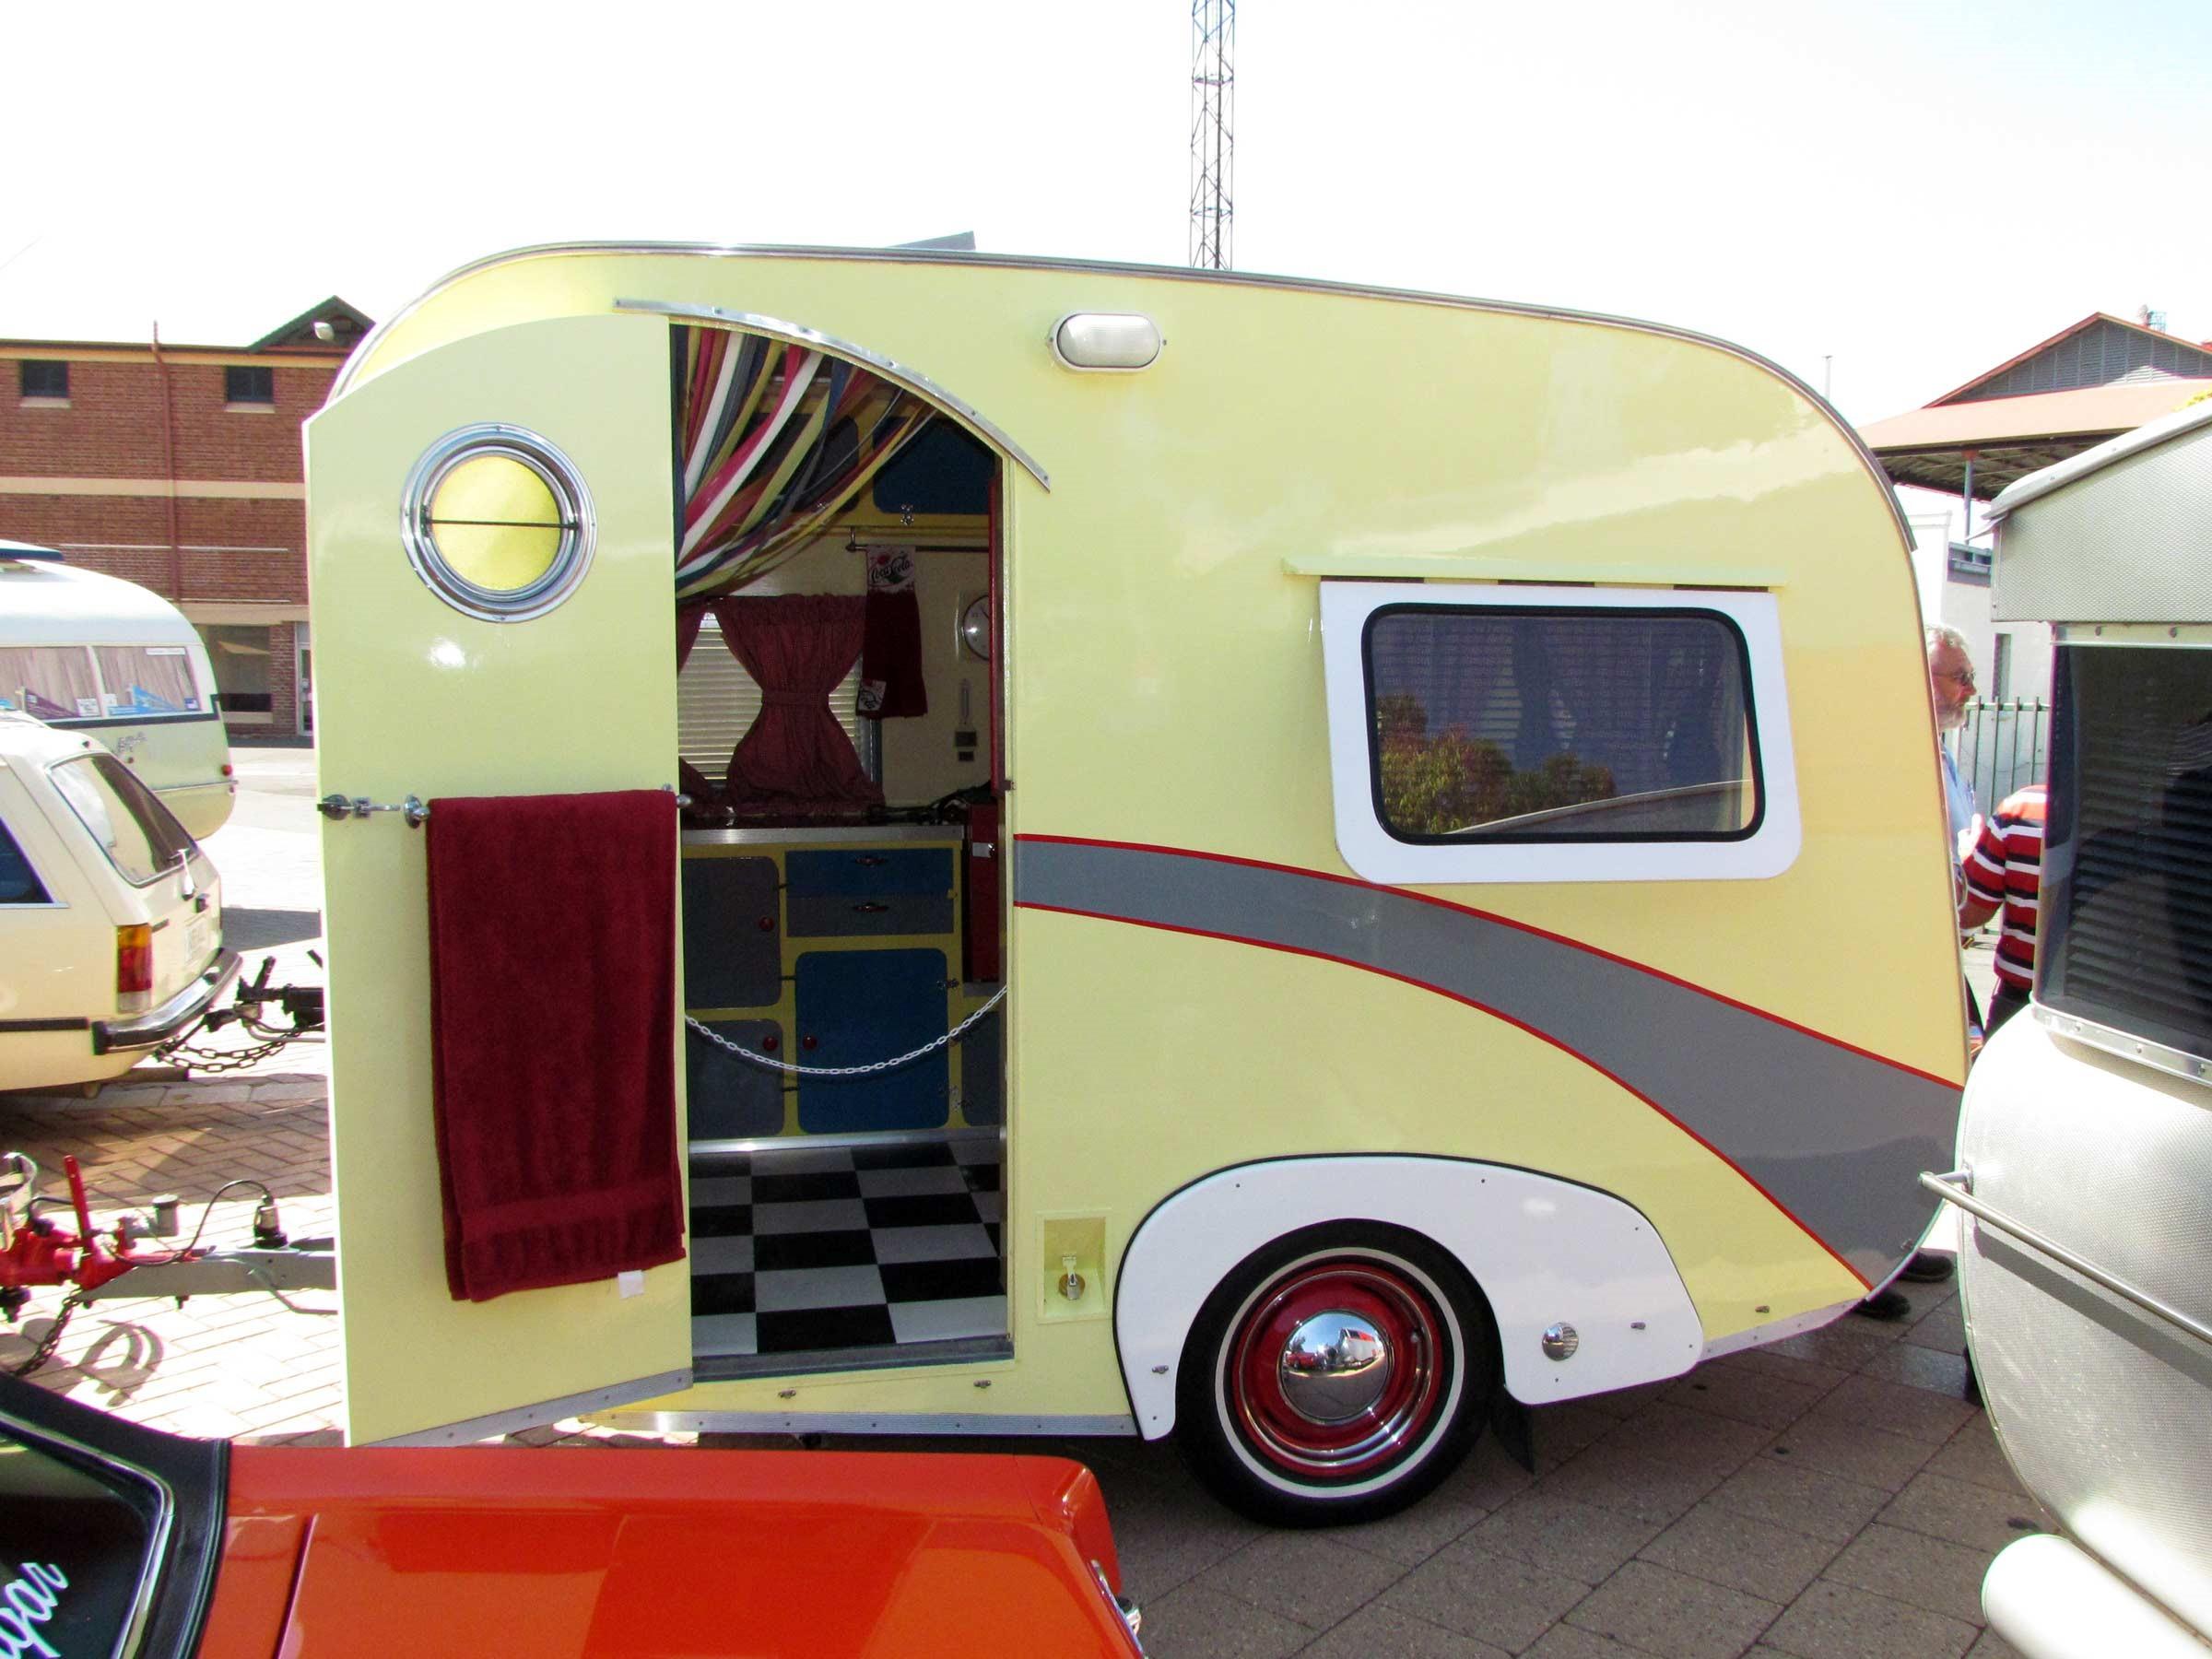 The 1950s homebuilt caravan